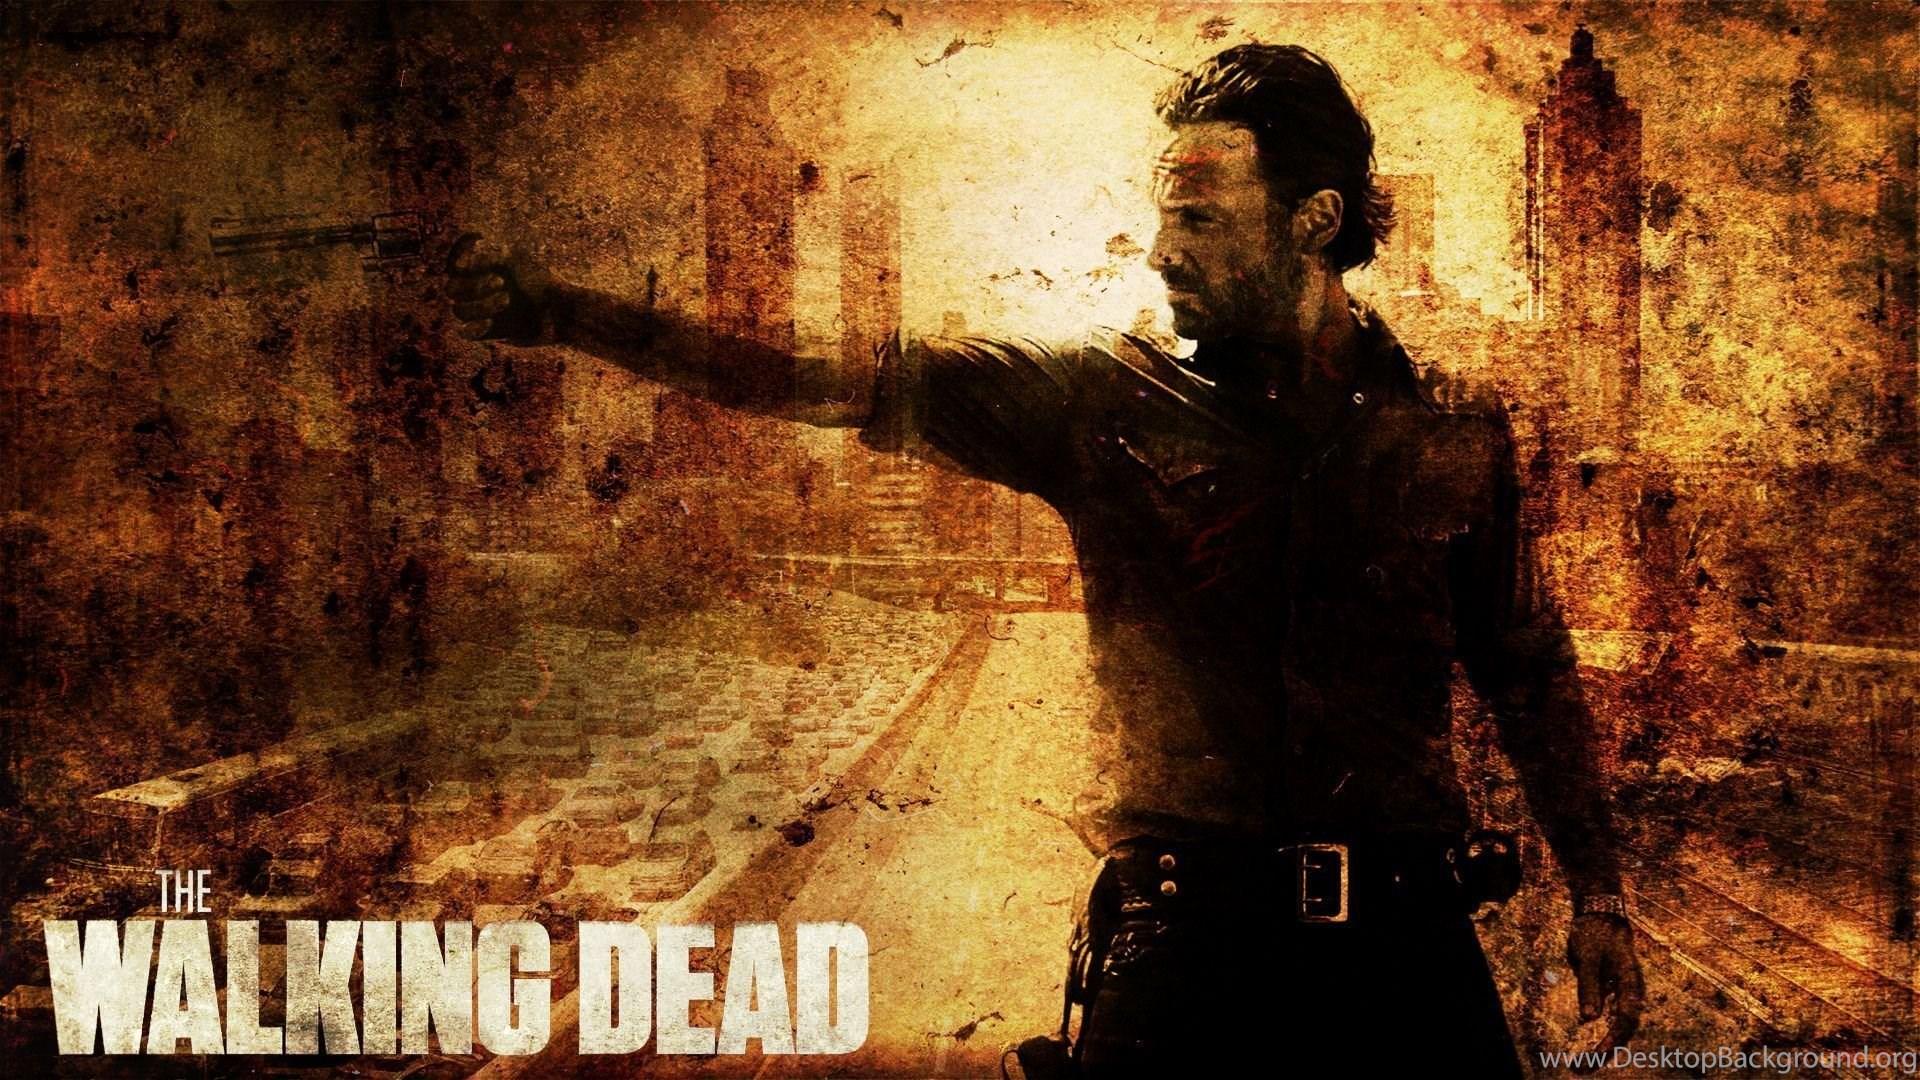 Top The Walking Dead Telltale Wallpaper Images For Pinterest